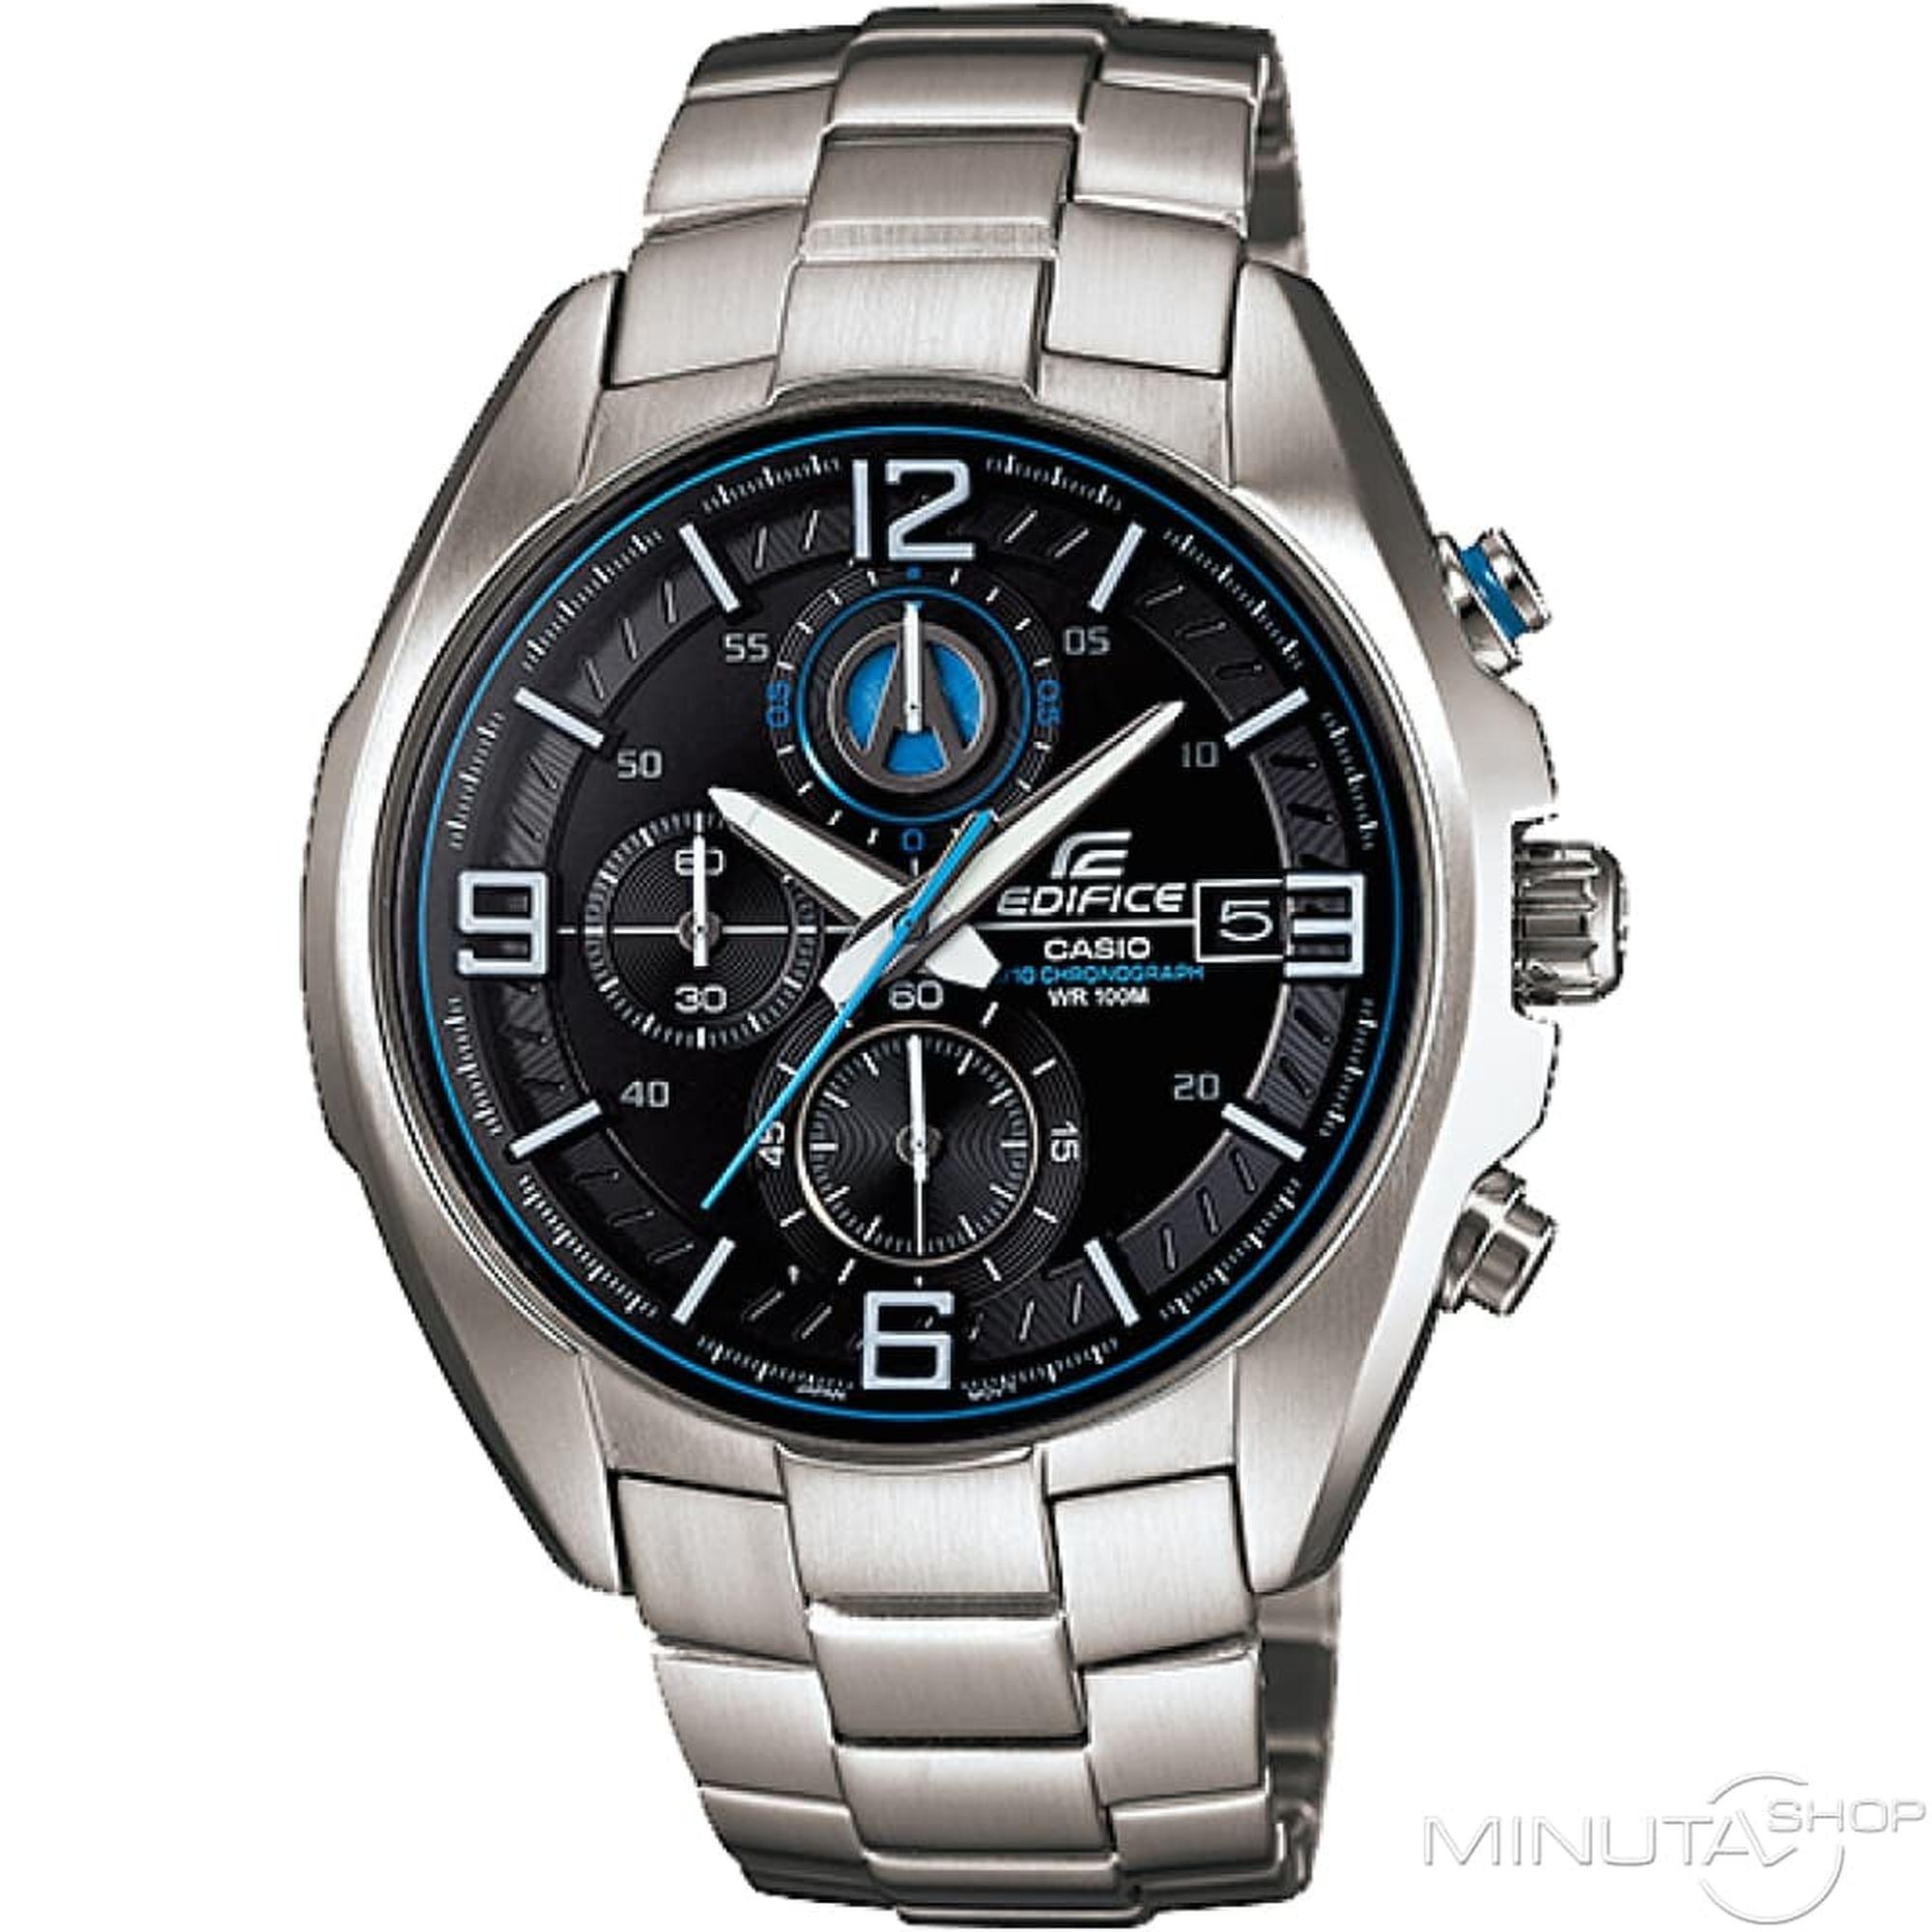 Casio Edifice 42mm Μαύρο με Ασημί Μπρασελέ EFR-529D-1A2V, ρολόι, ανδρικό ρολόι, Casio, Casio ρολόι, δωρεάν μεταφορικά, άμεση διαθεσιμότητα